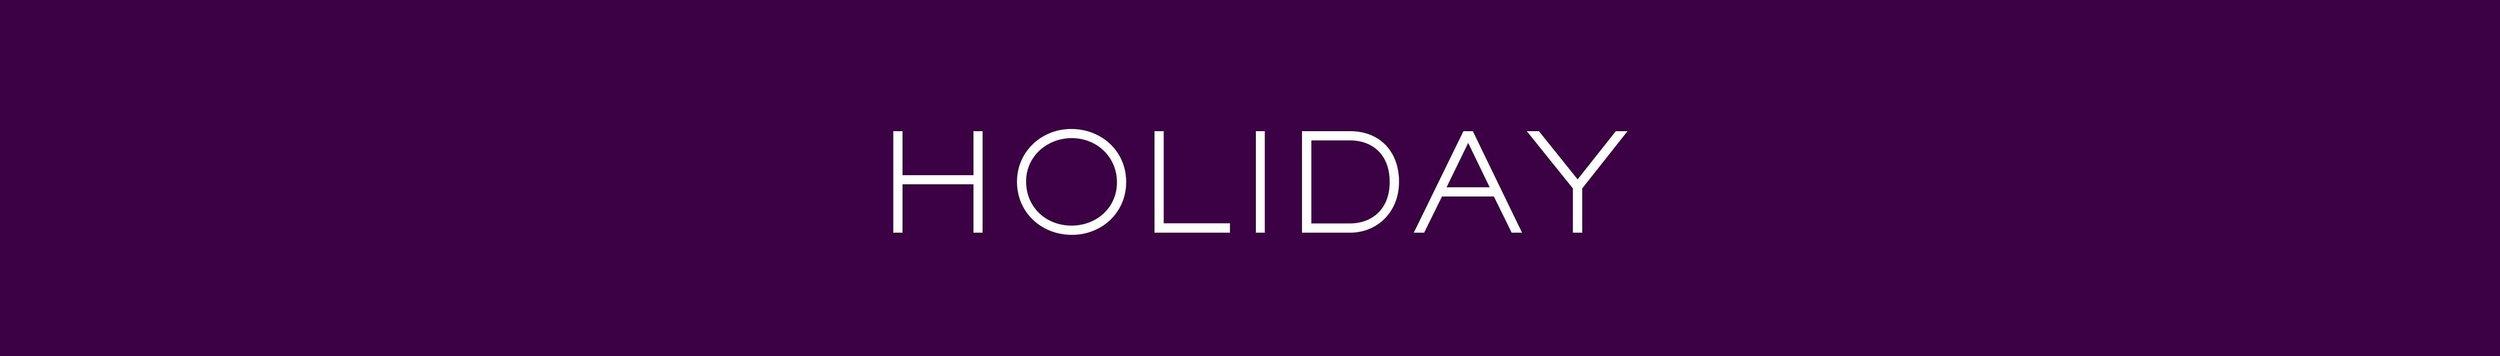 Tag_Header_Holiday.jpg